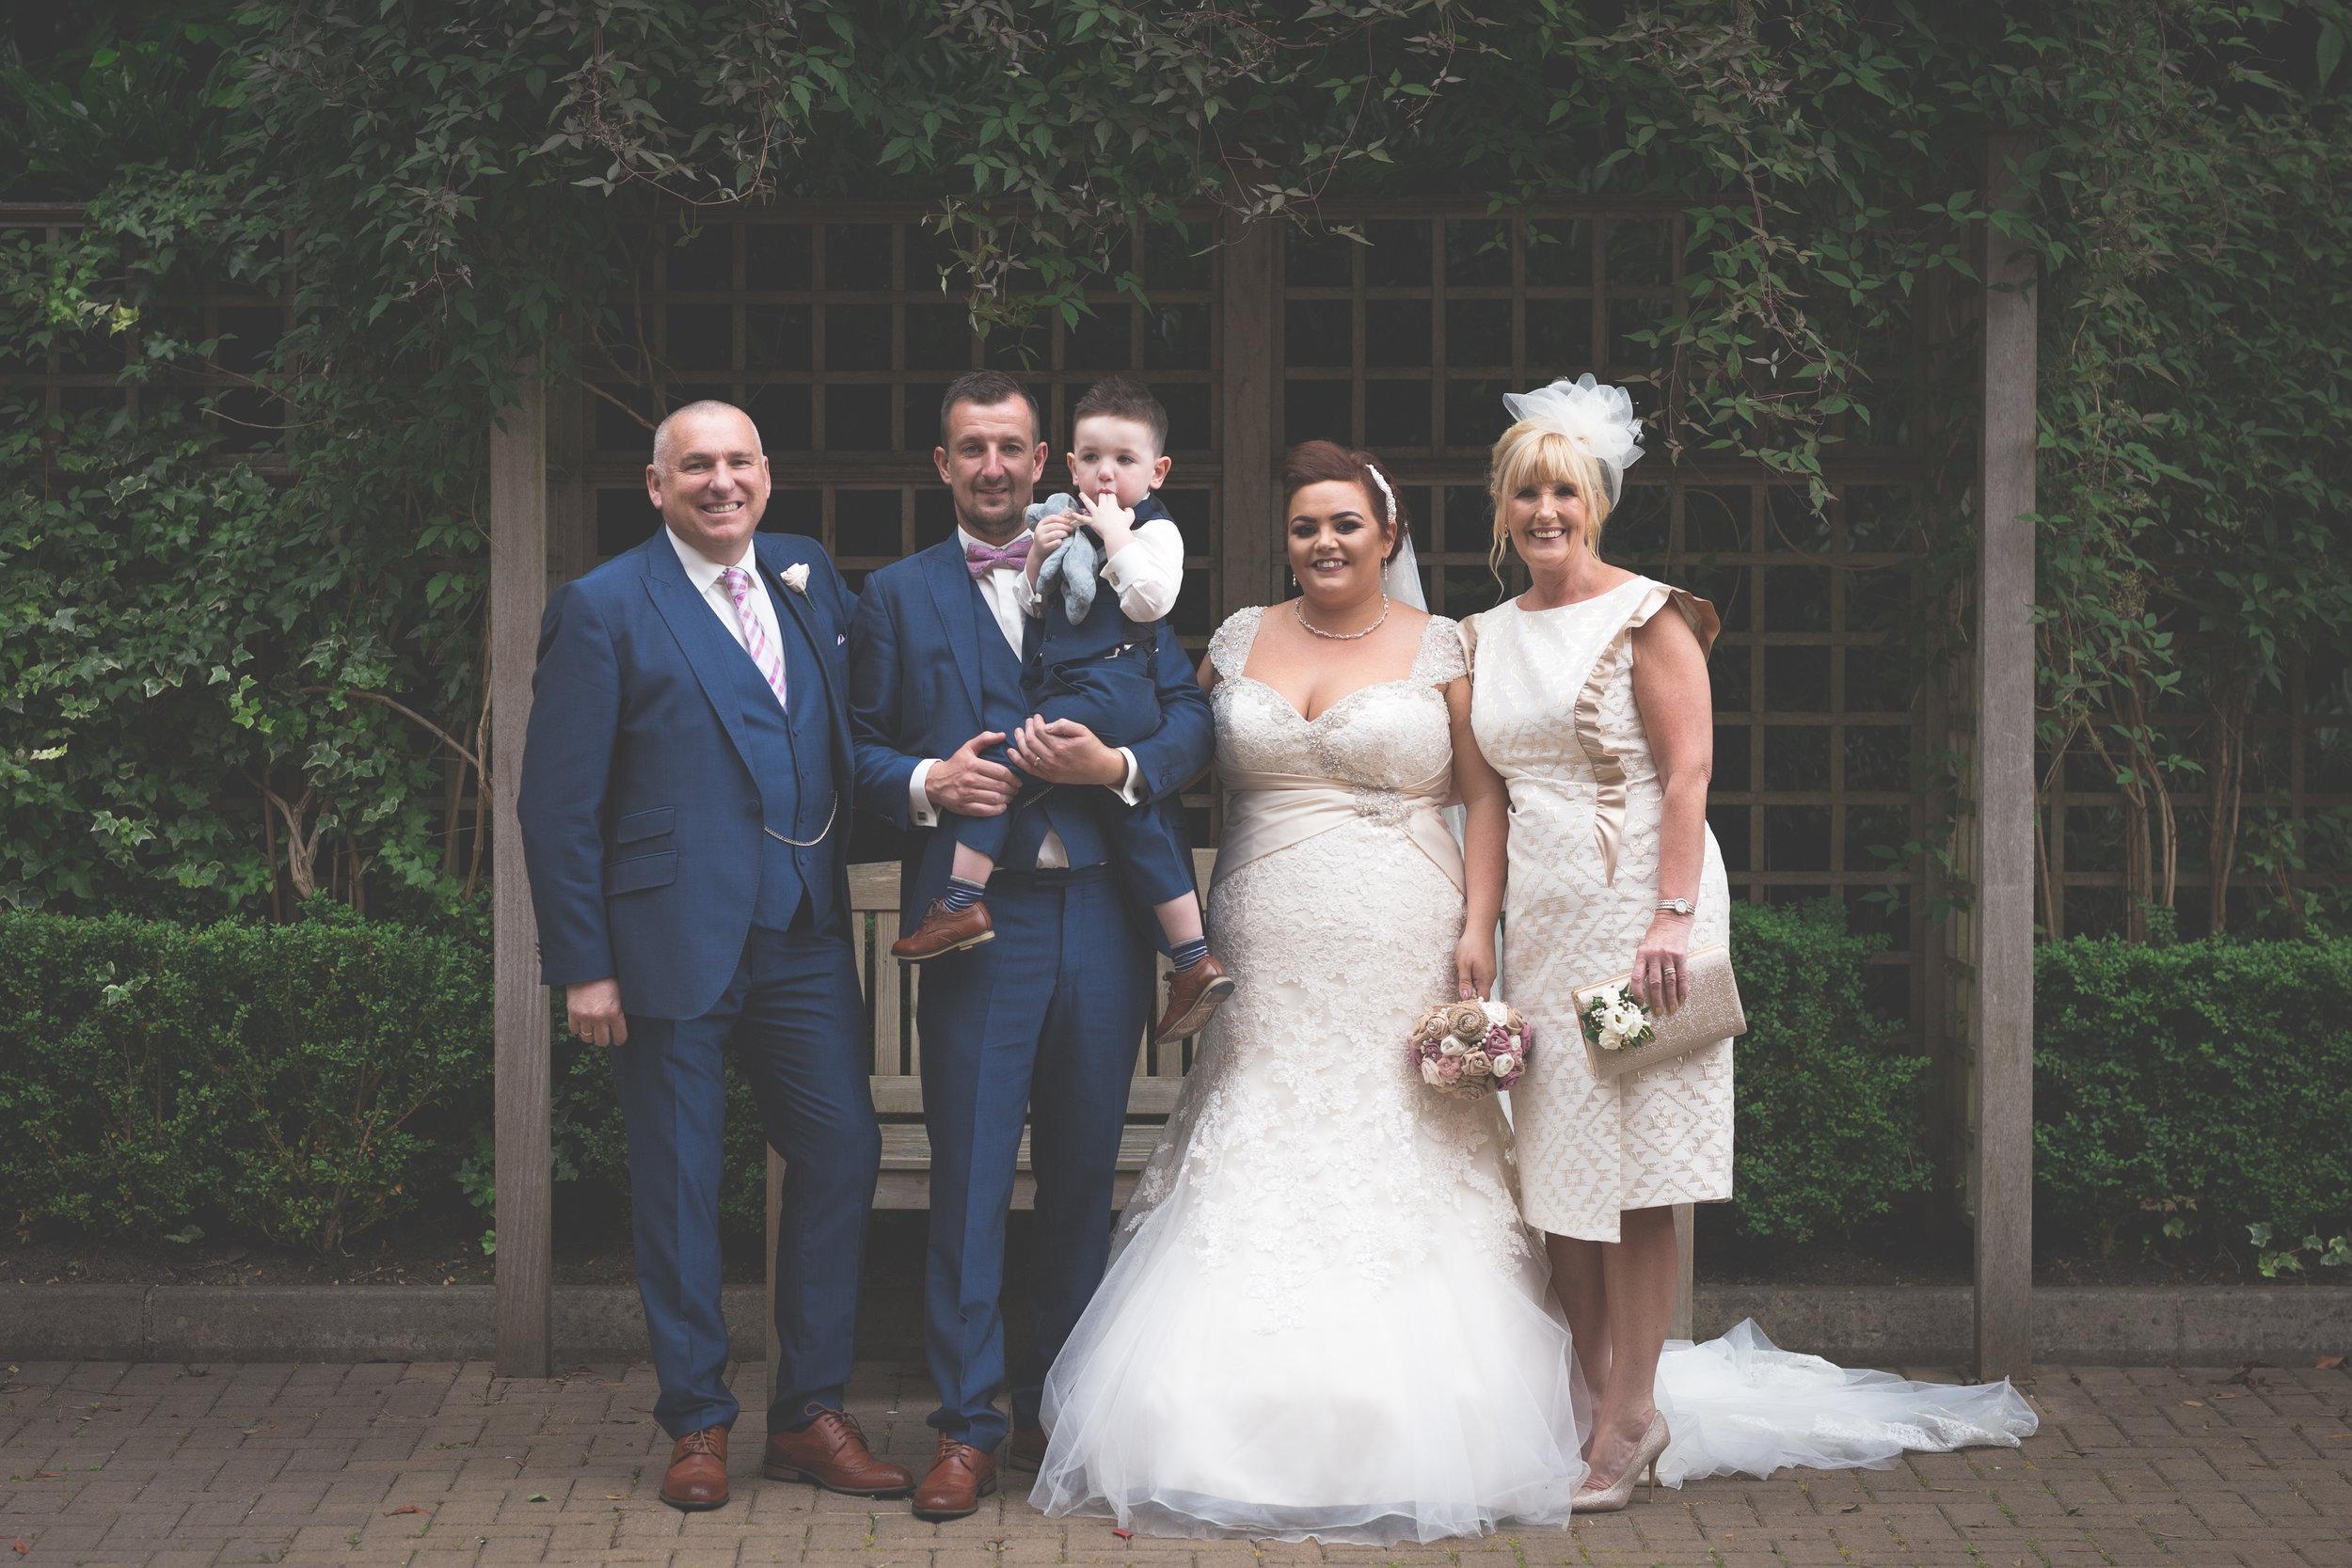 Antoinette & Stephen - Portraits   Brian McEwan Photography   Wedding Photographer Northern Ireland 50.jpg